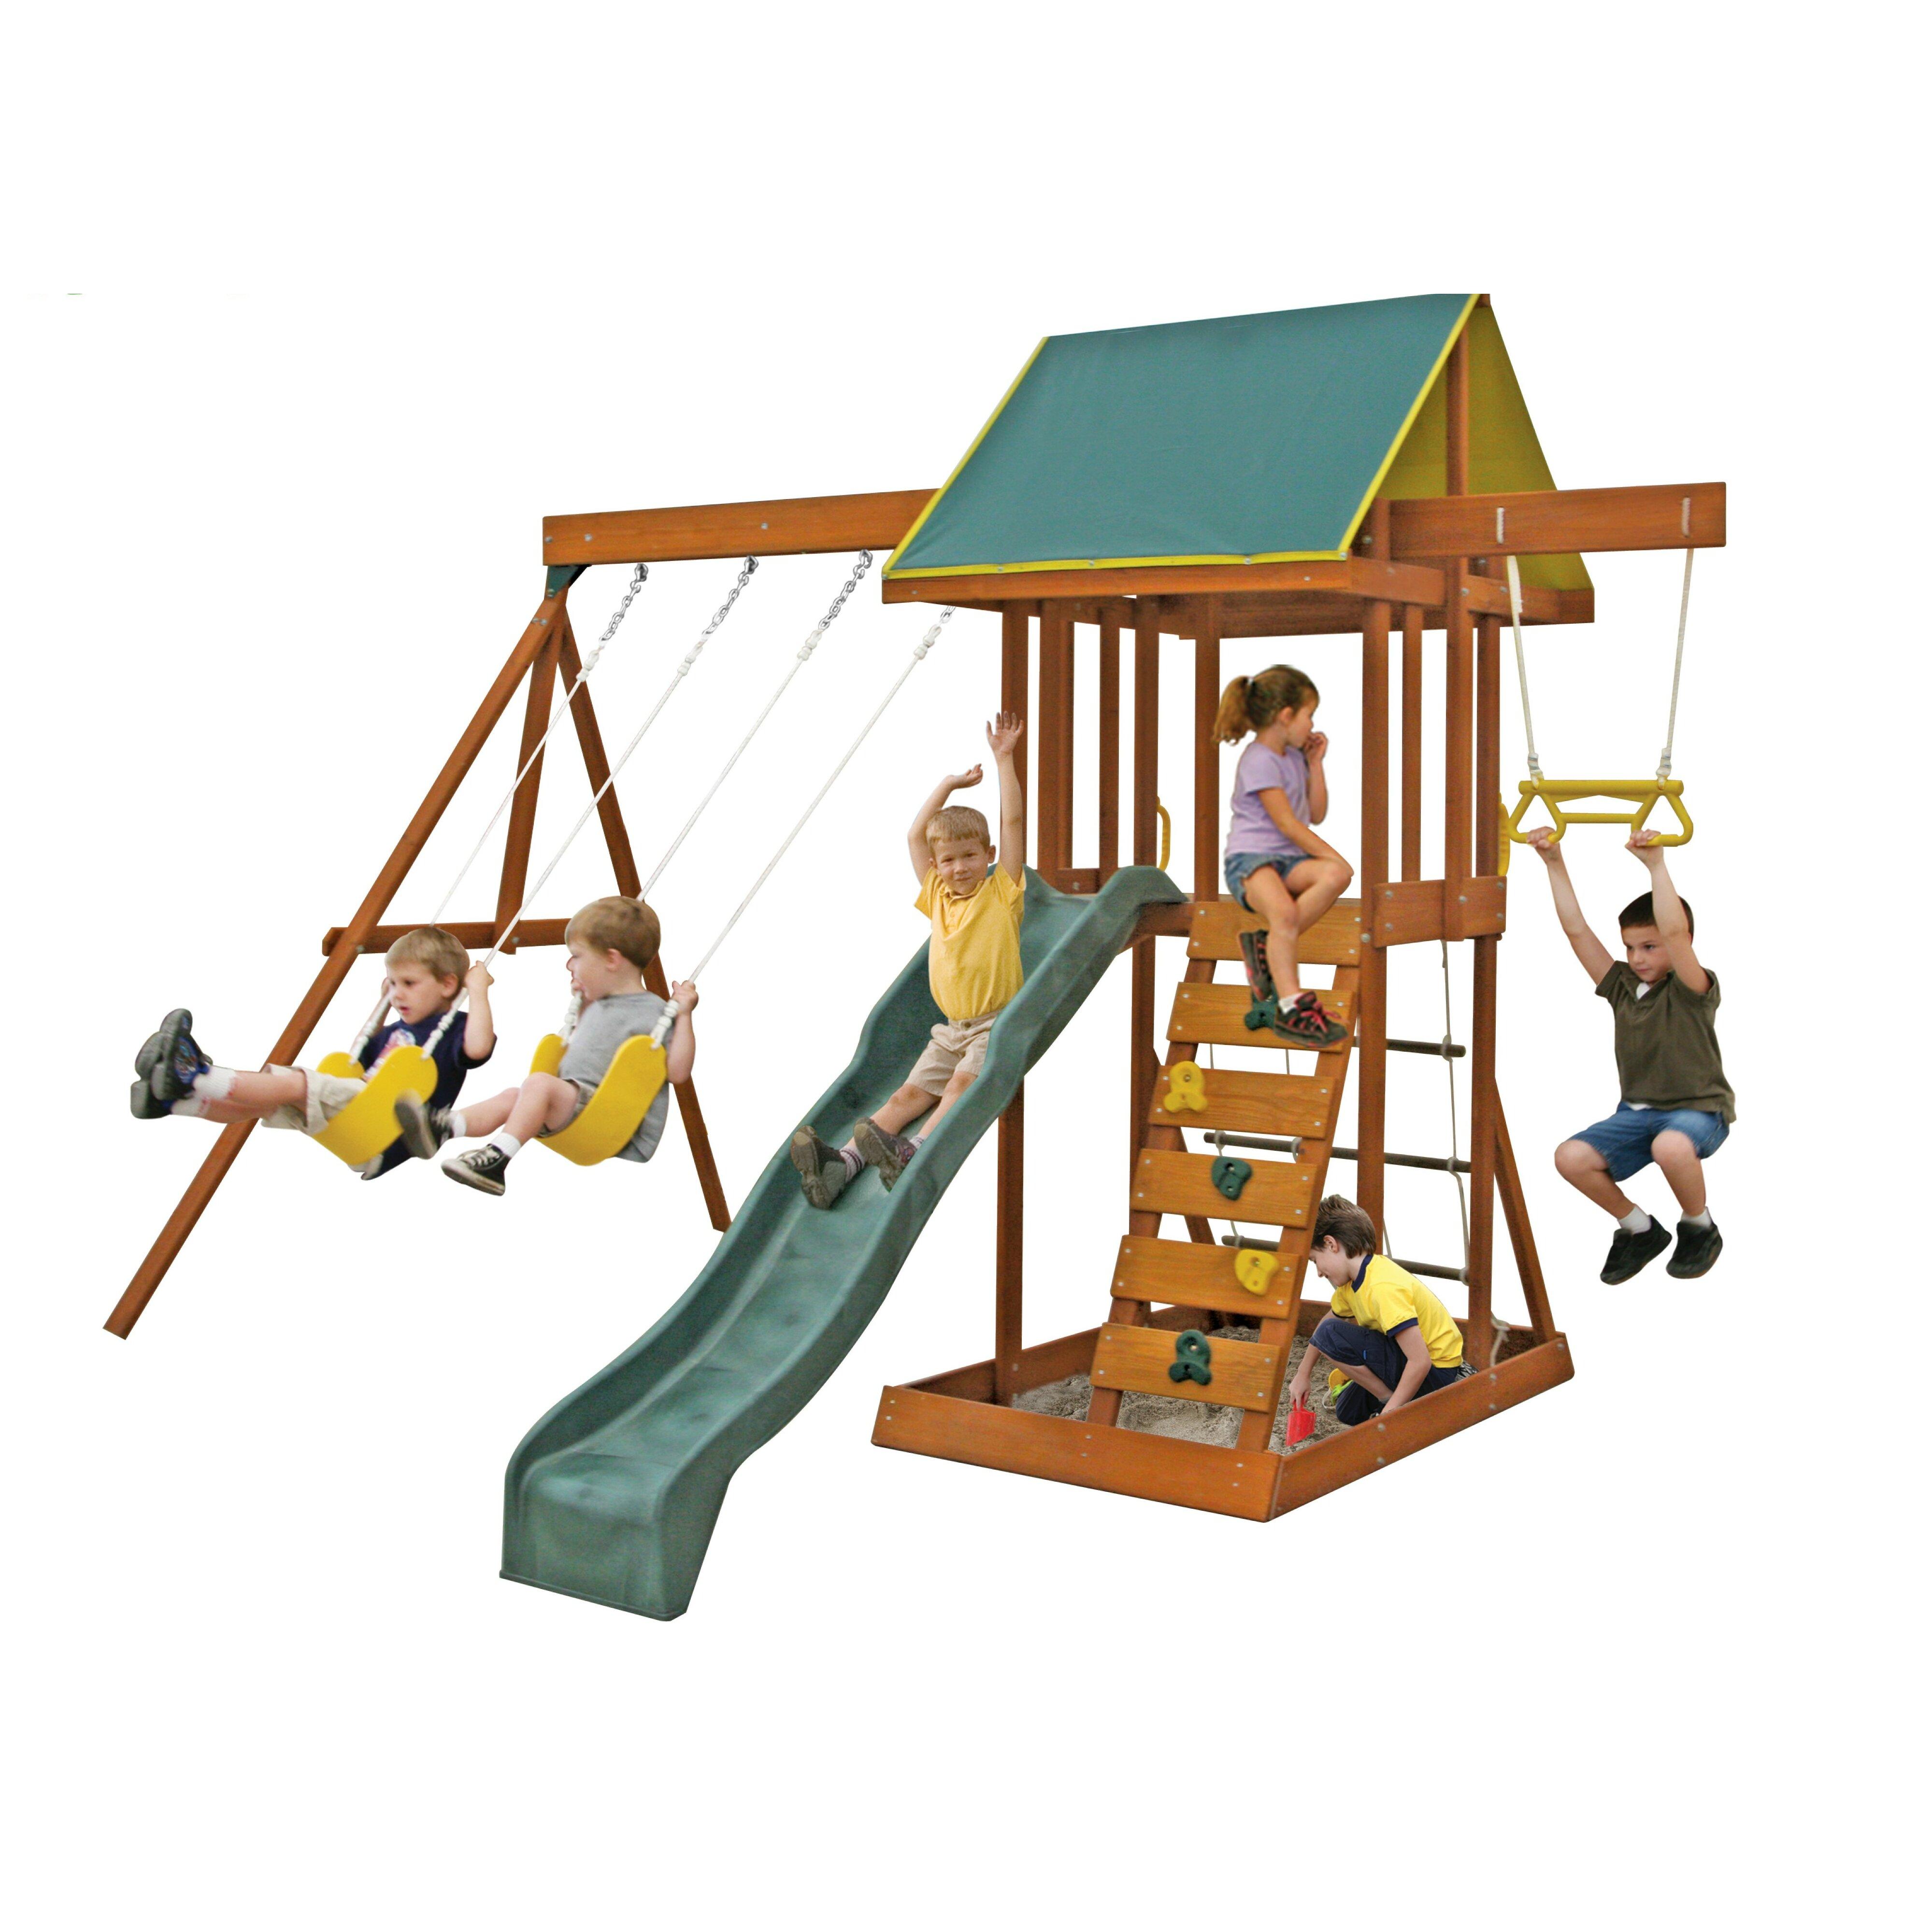 viv rae scout meadowvale wooden swing set reviews. Black Bedroom Furniture Sets. Home Design Ideas